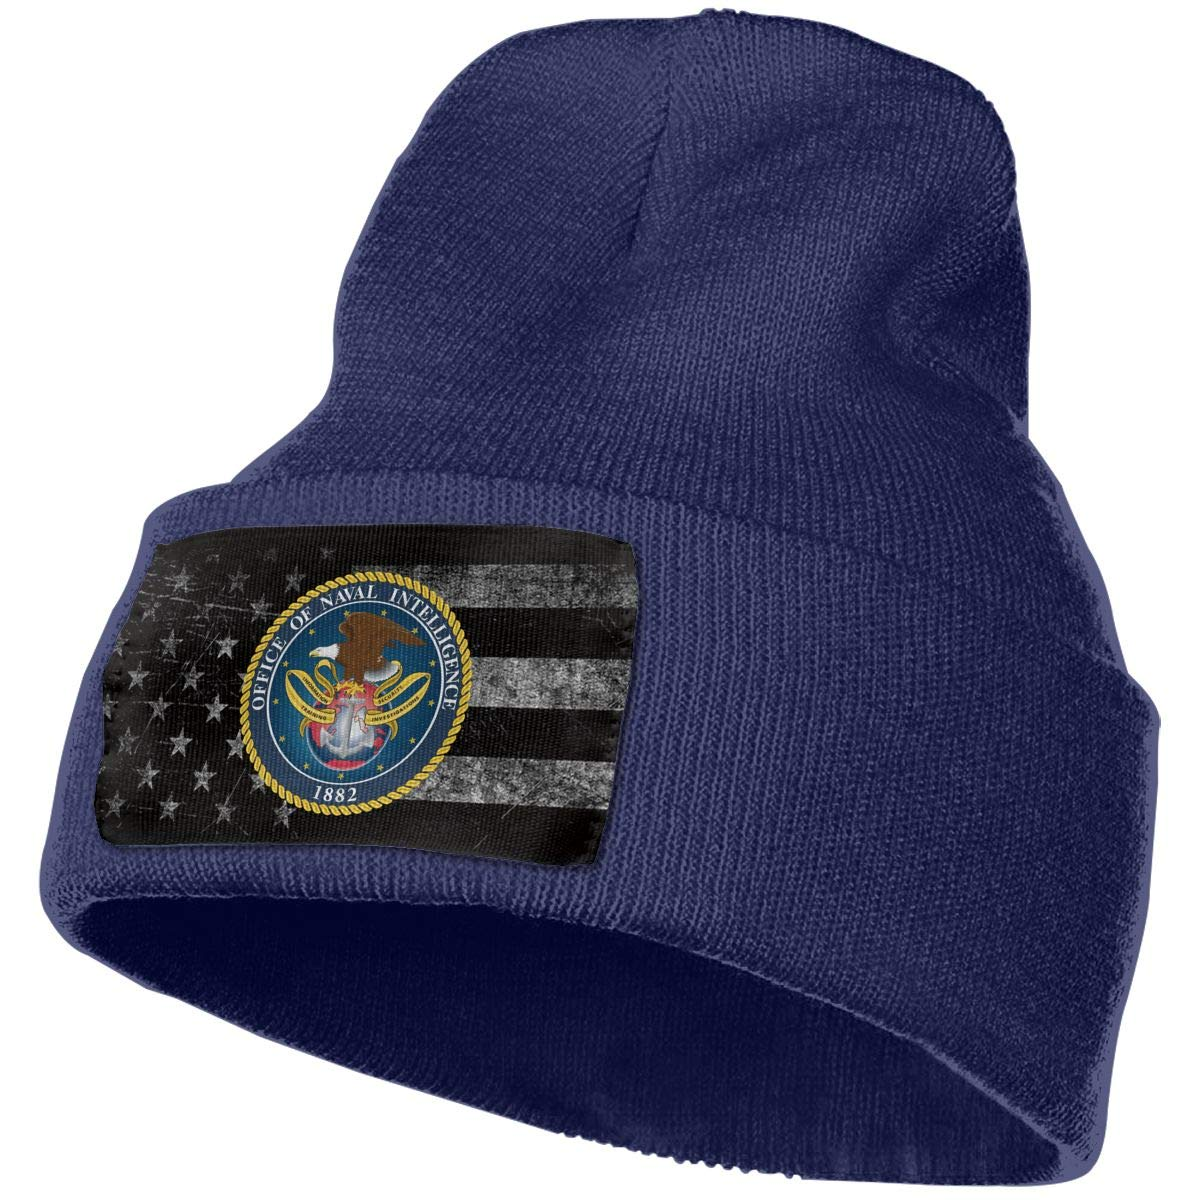 FORDSAN CP US Army Brigadier General Mens Beanie Cap Skull Cap Winter Warm Knitting Hats.